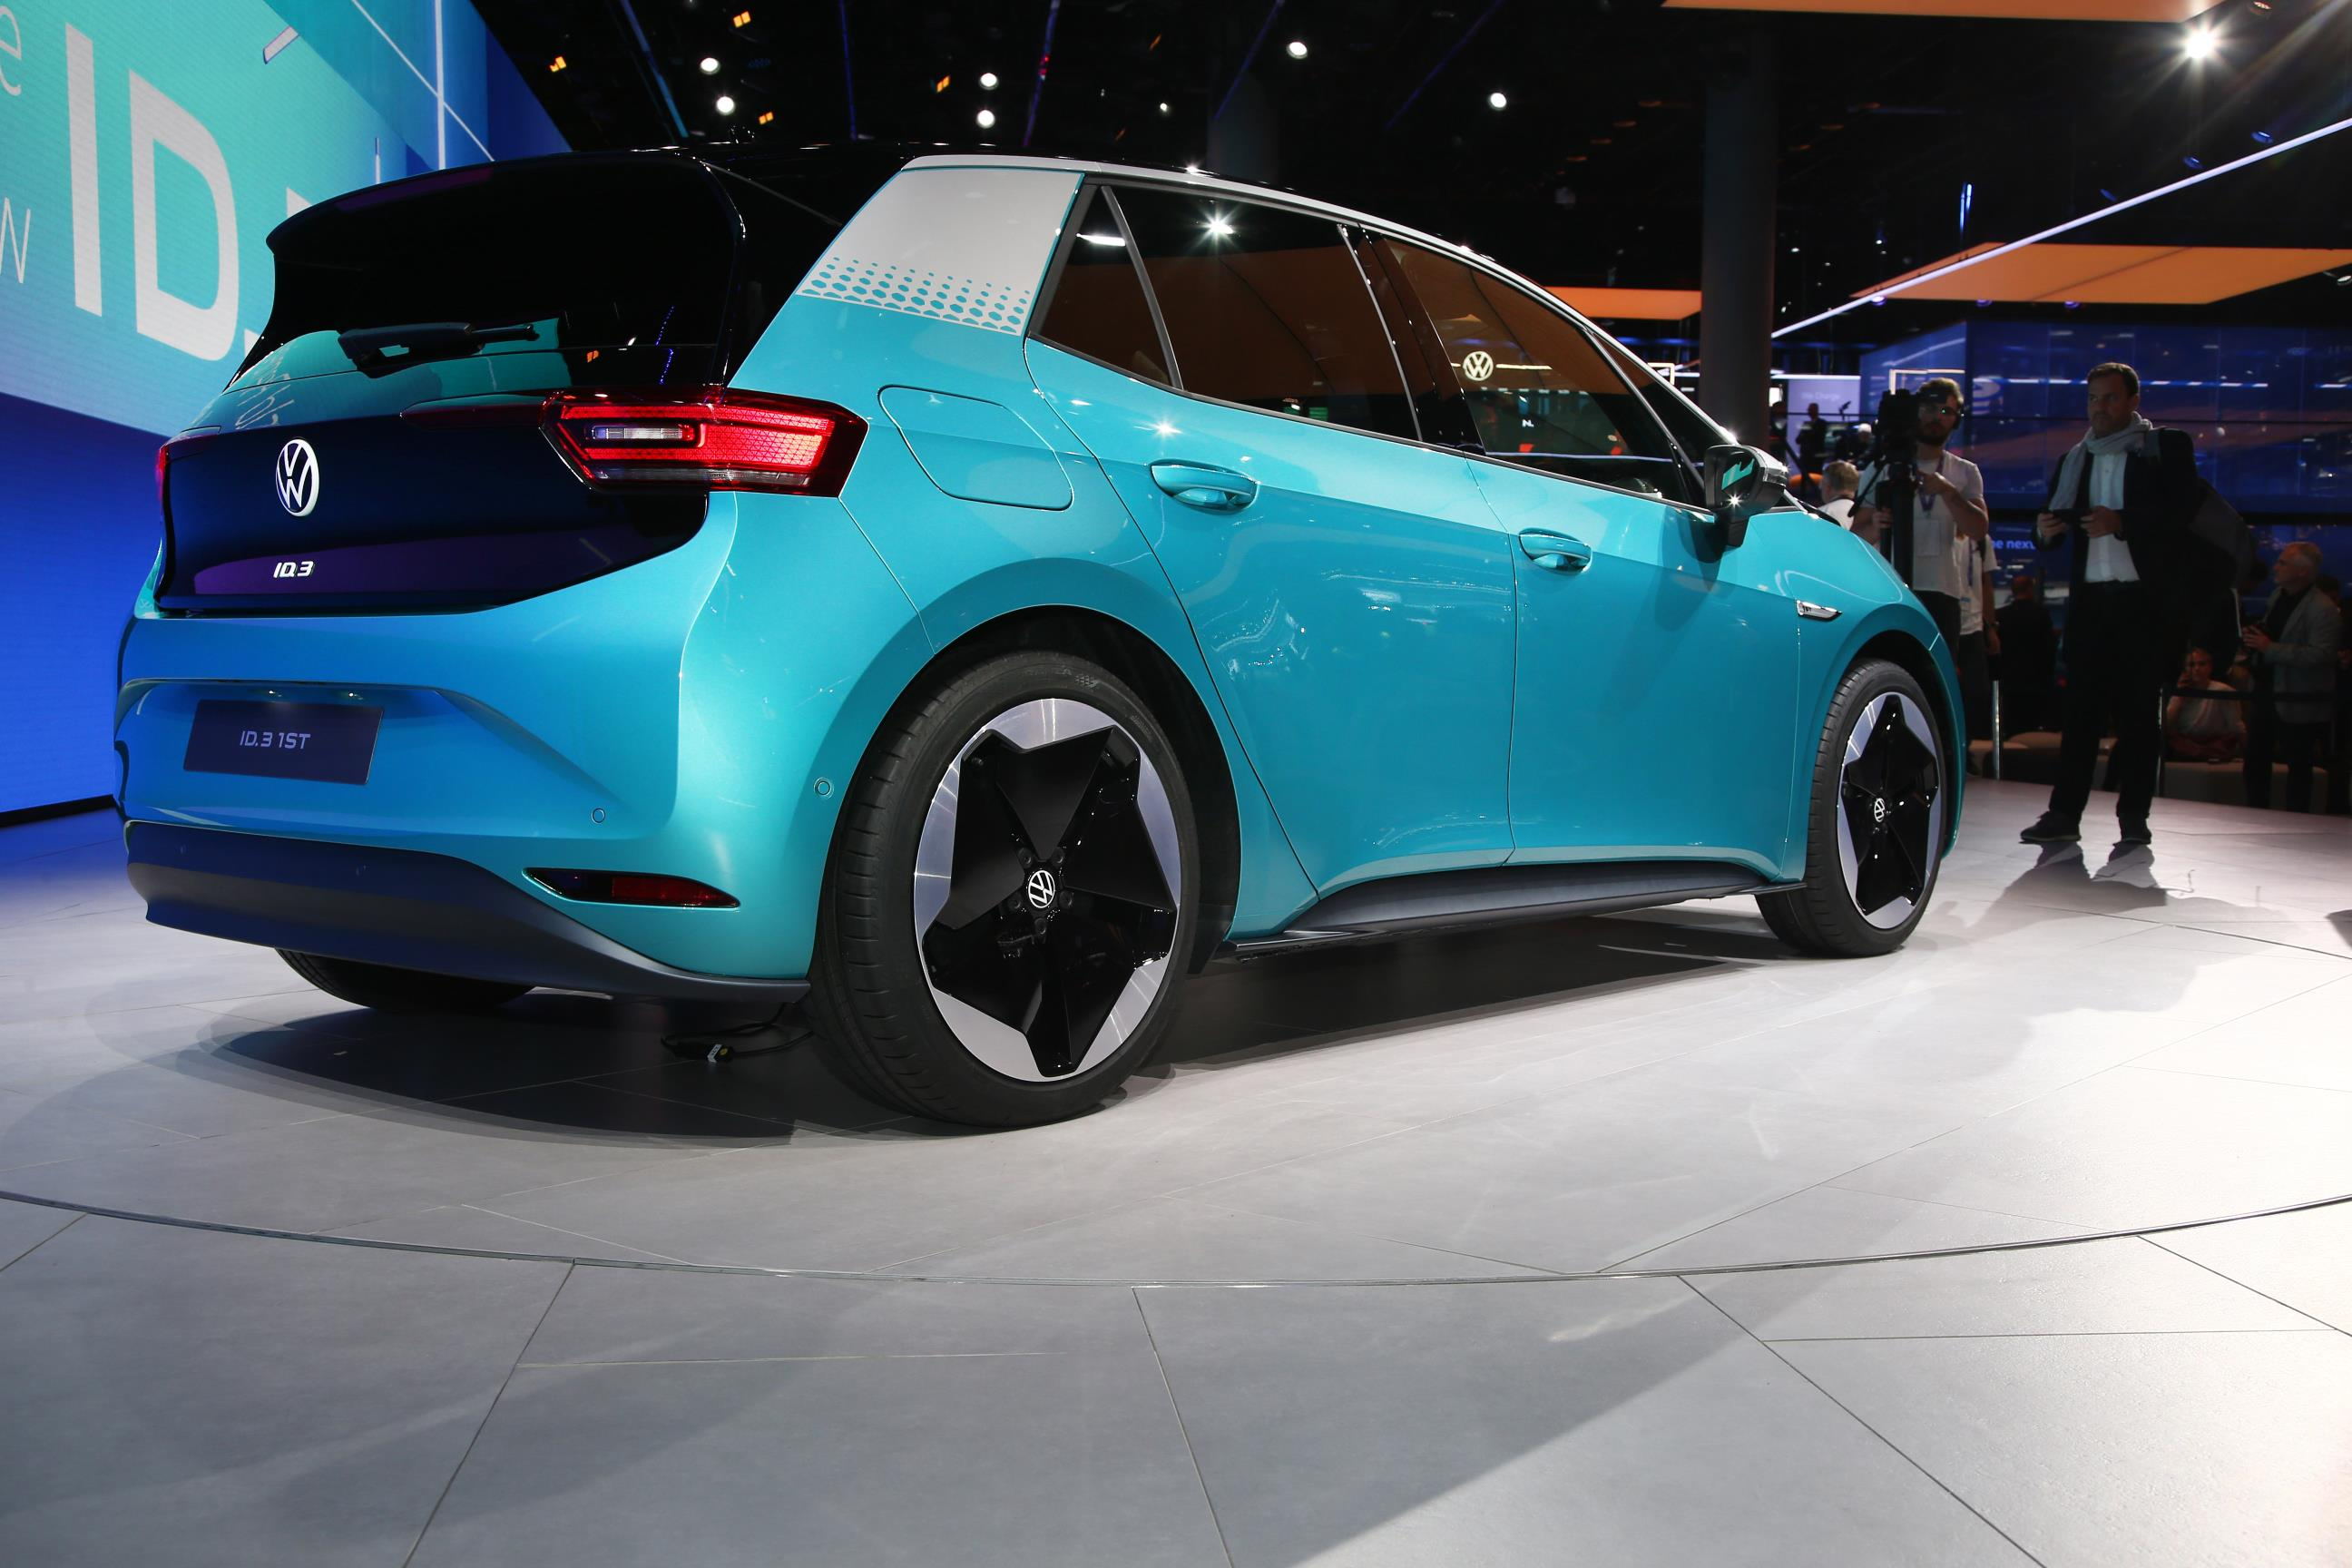 VW ID.3 Price